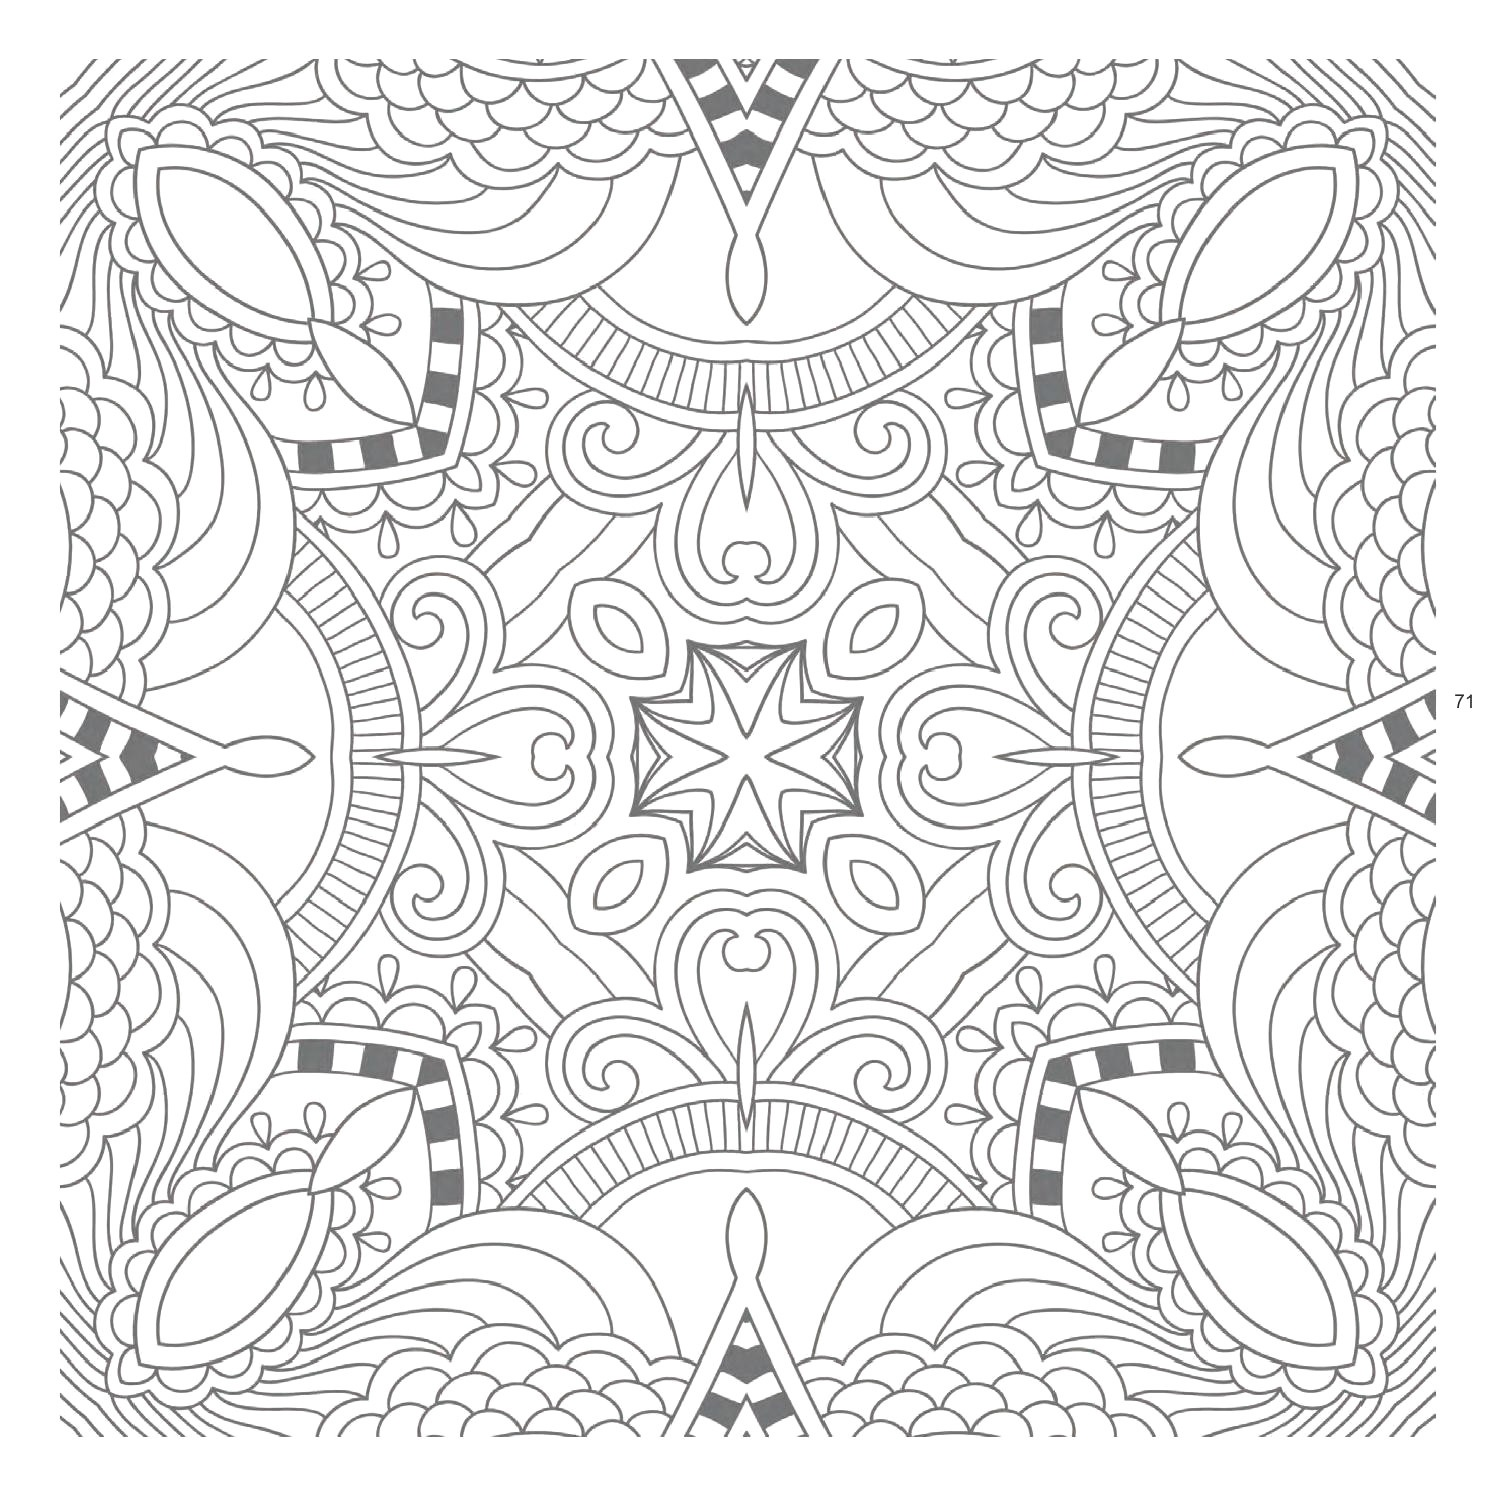 Awesome Free Printable Zentangle Templates : Coloring Pages - Free Printable Zentangle Templates